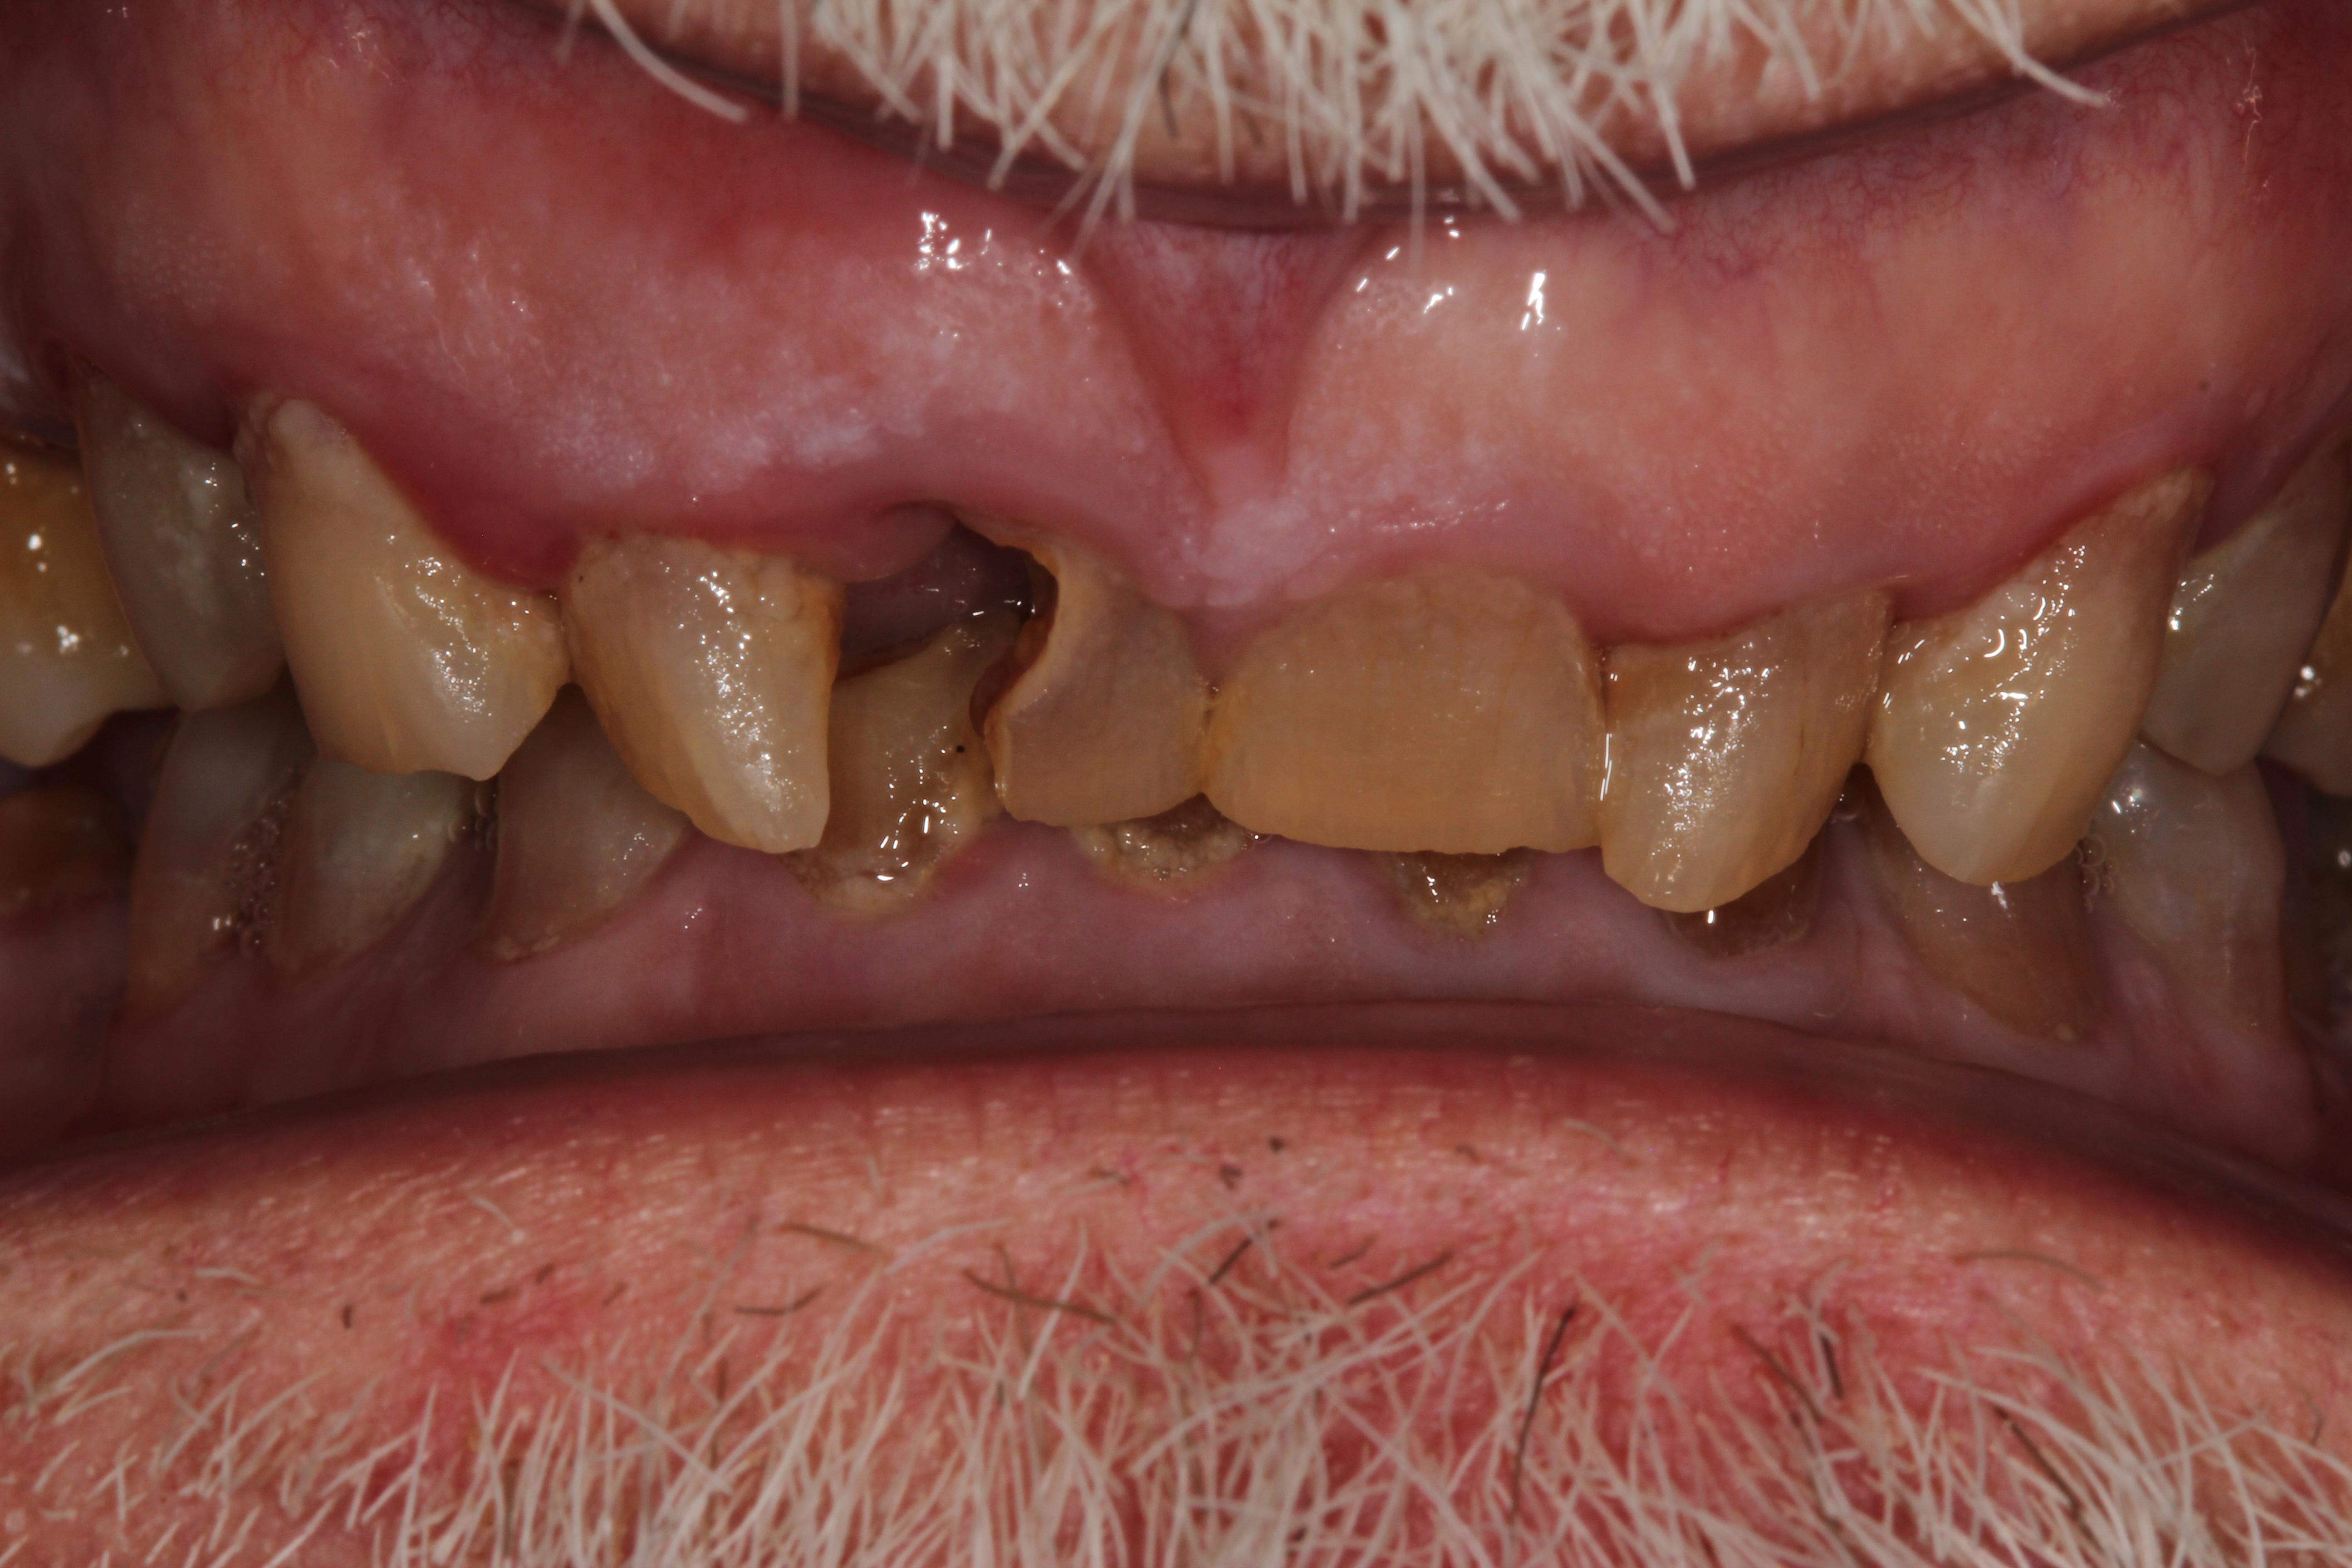 Before White Wolf Dental implant dentures